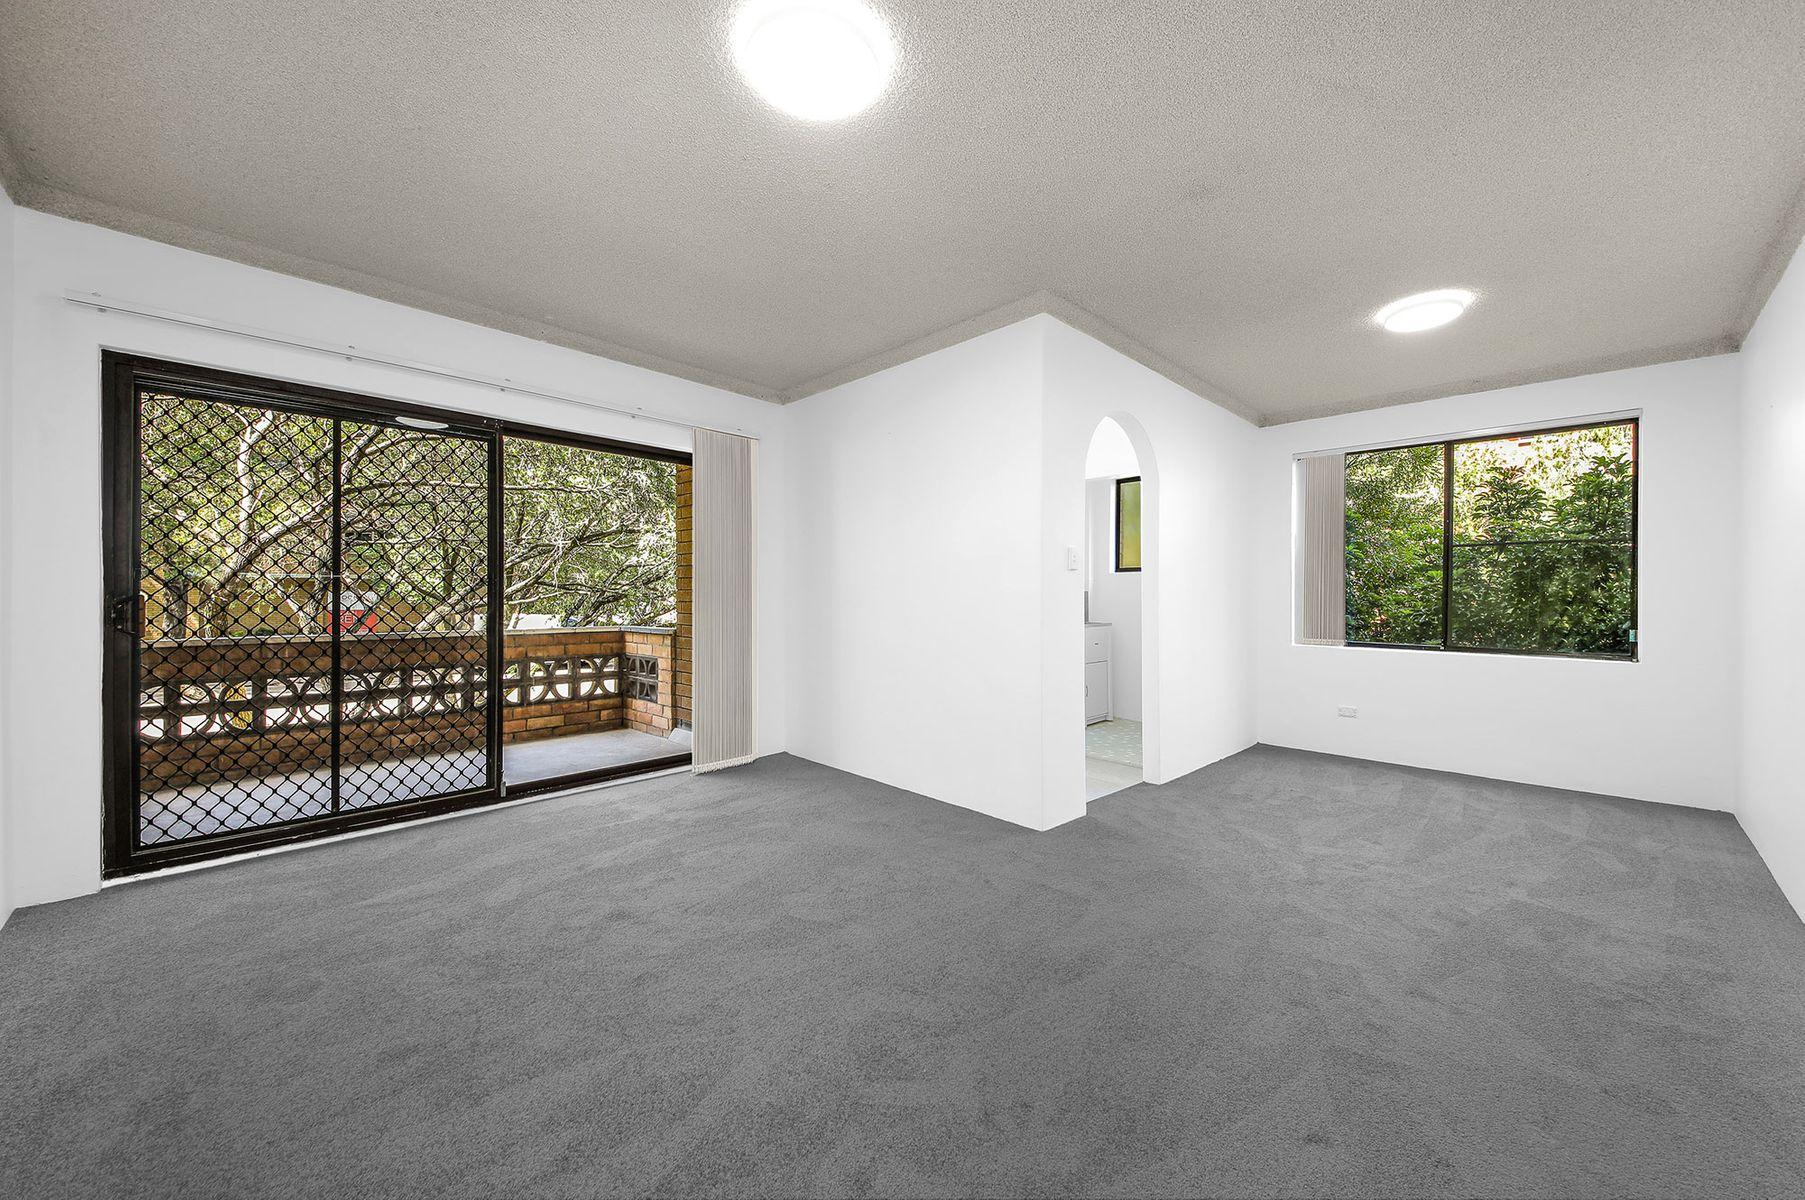 7/40 Station Street, Mortdale, NSW 2223